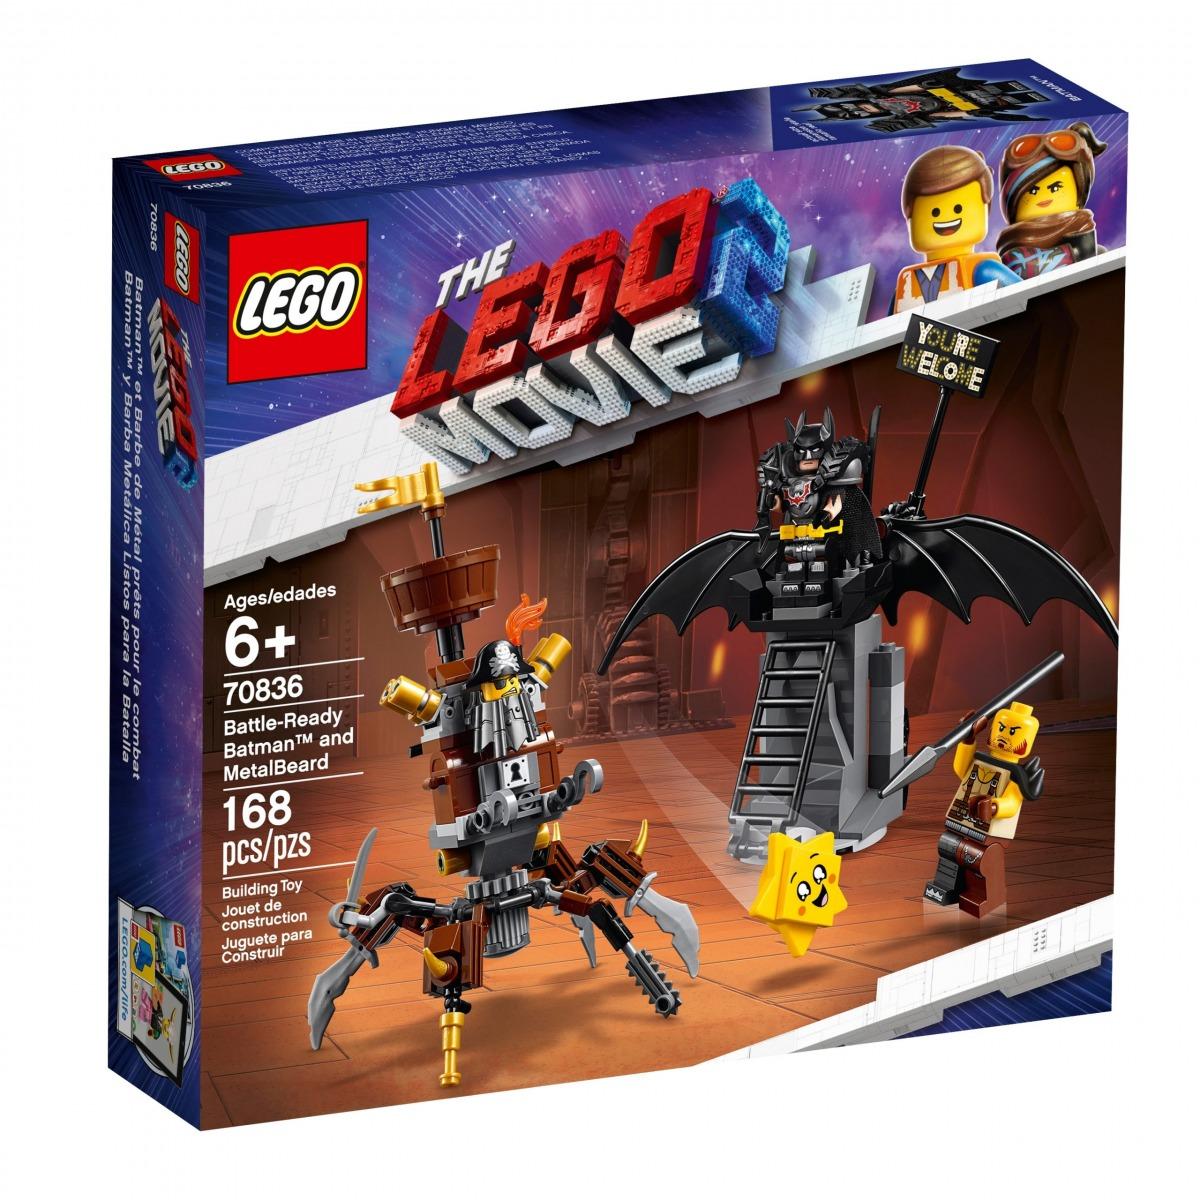 lego 70836 battle ready batman and metalbeard scaled